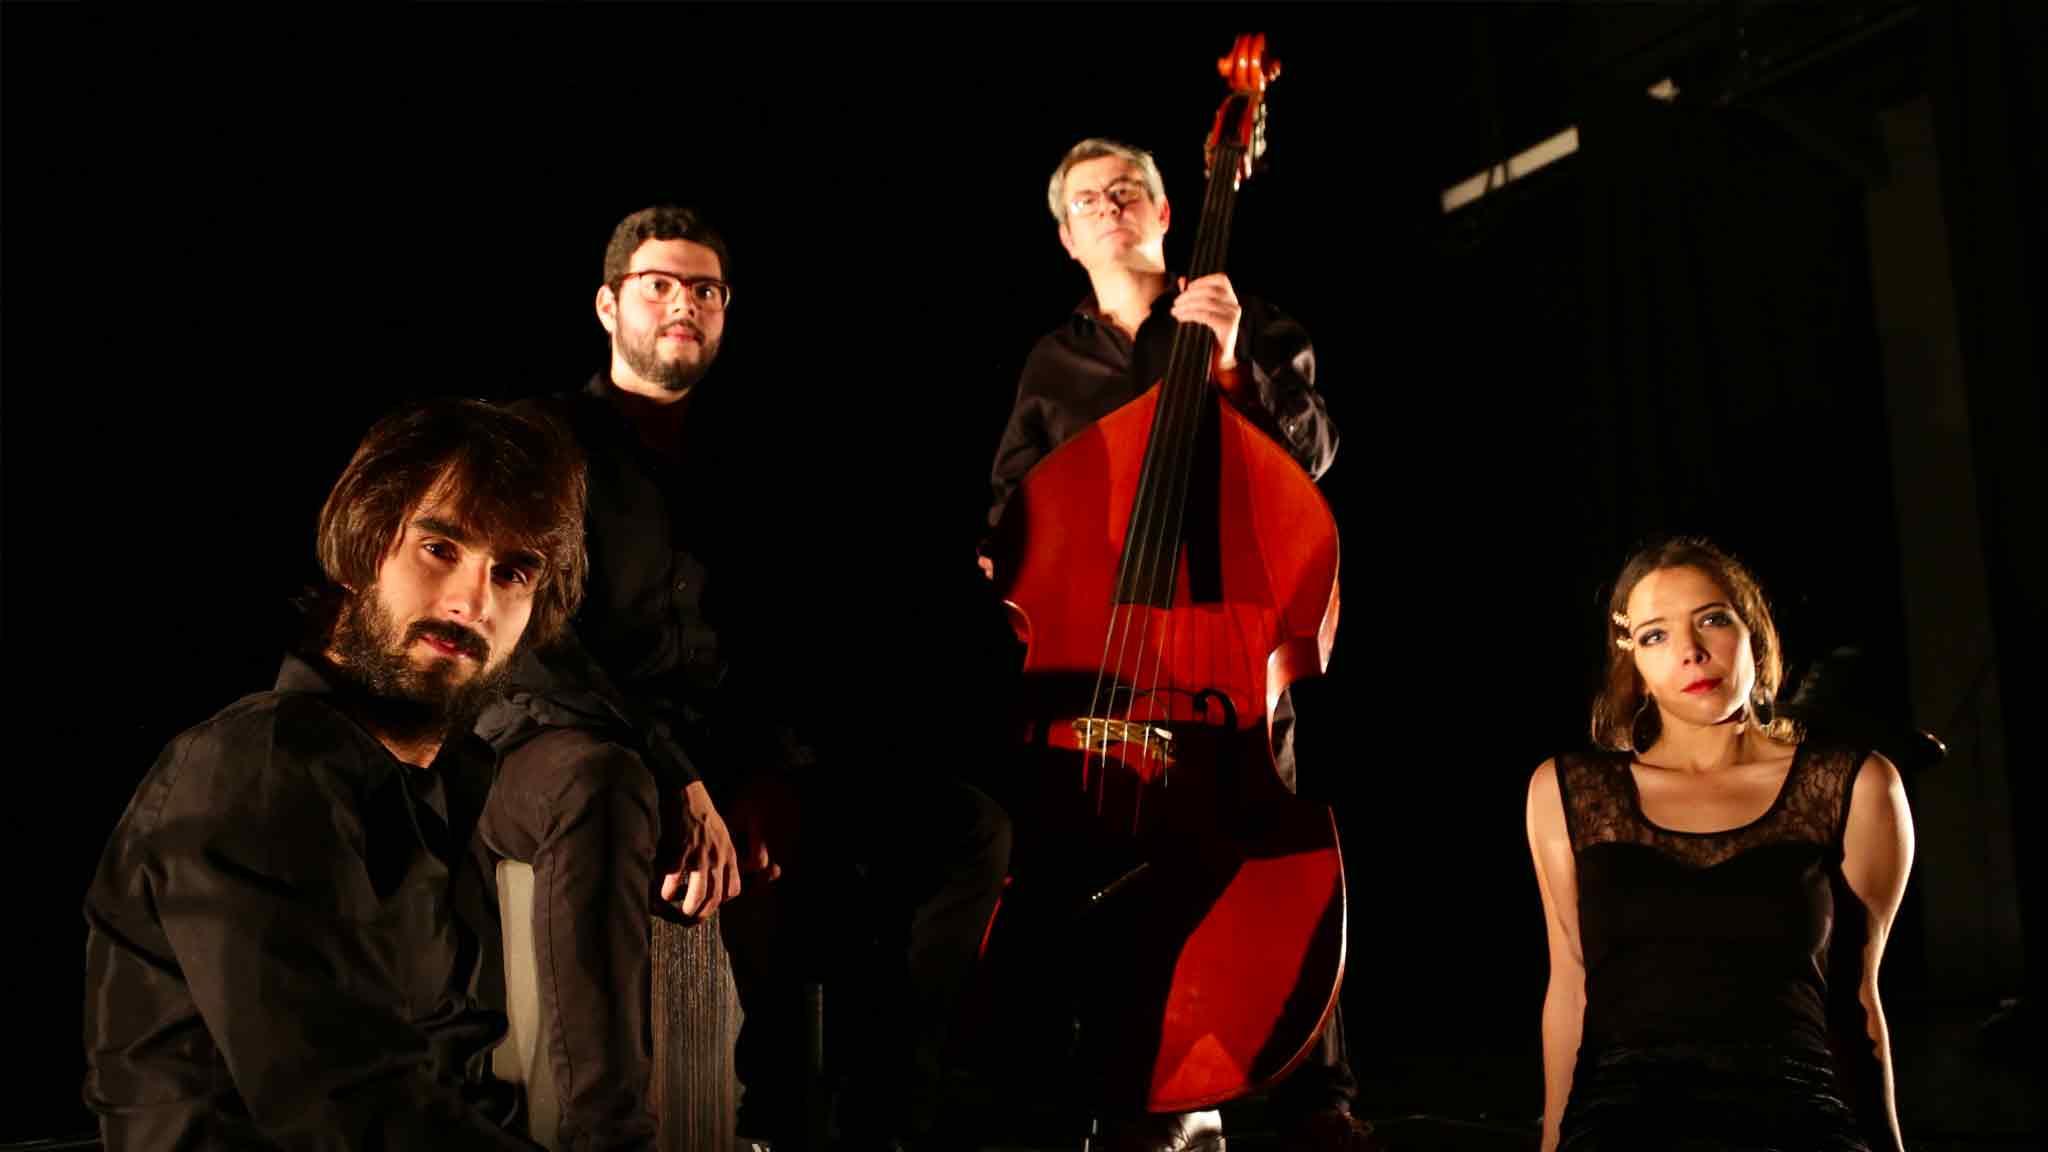 Présentation de la Compagnie de flamenco Minera